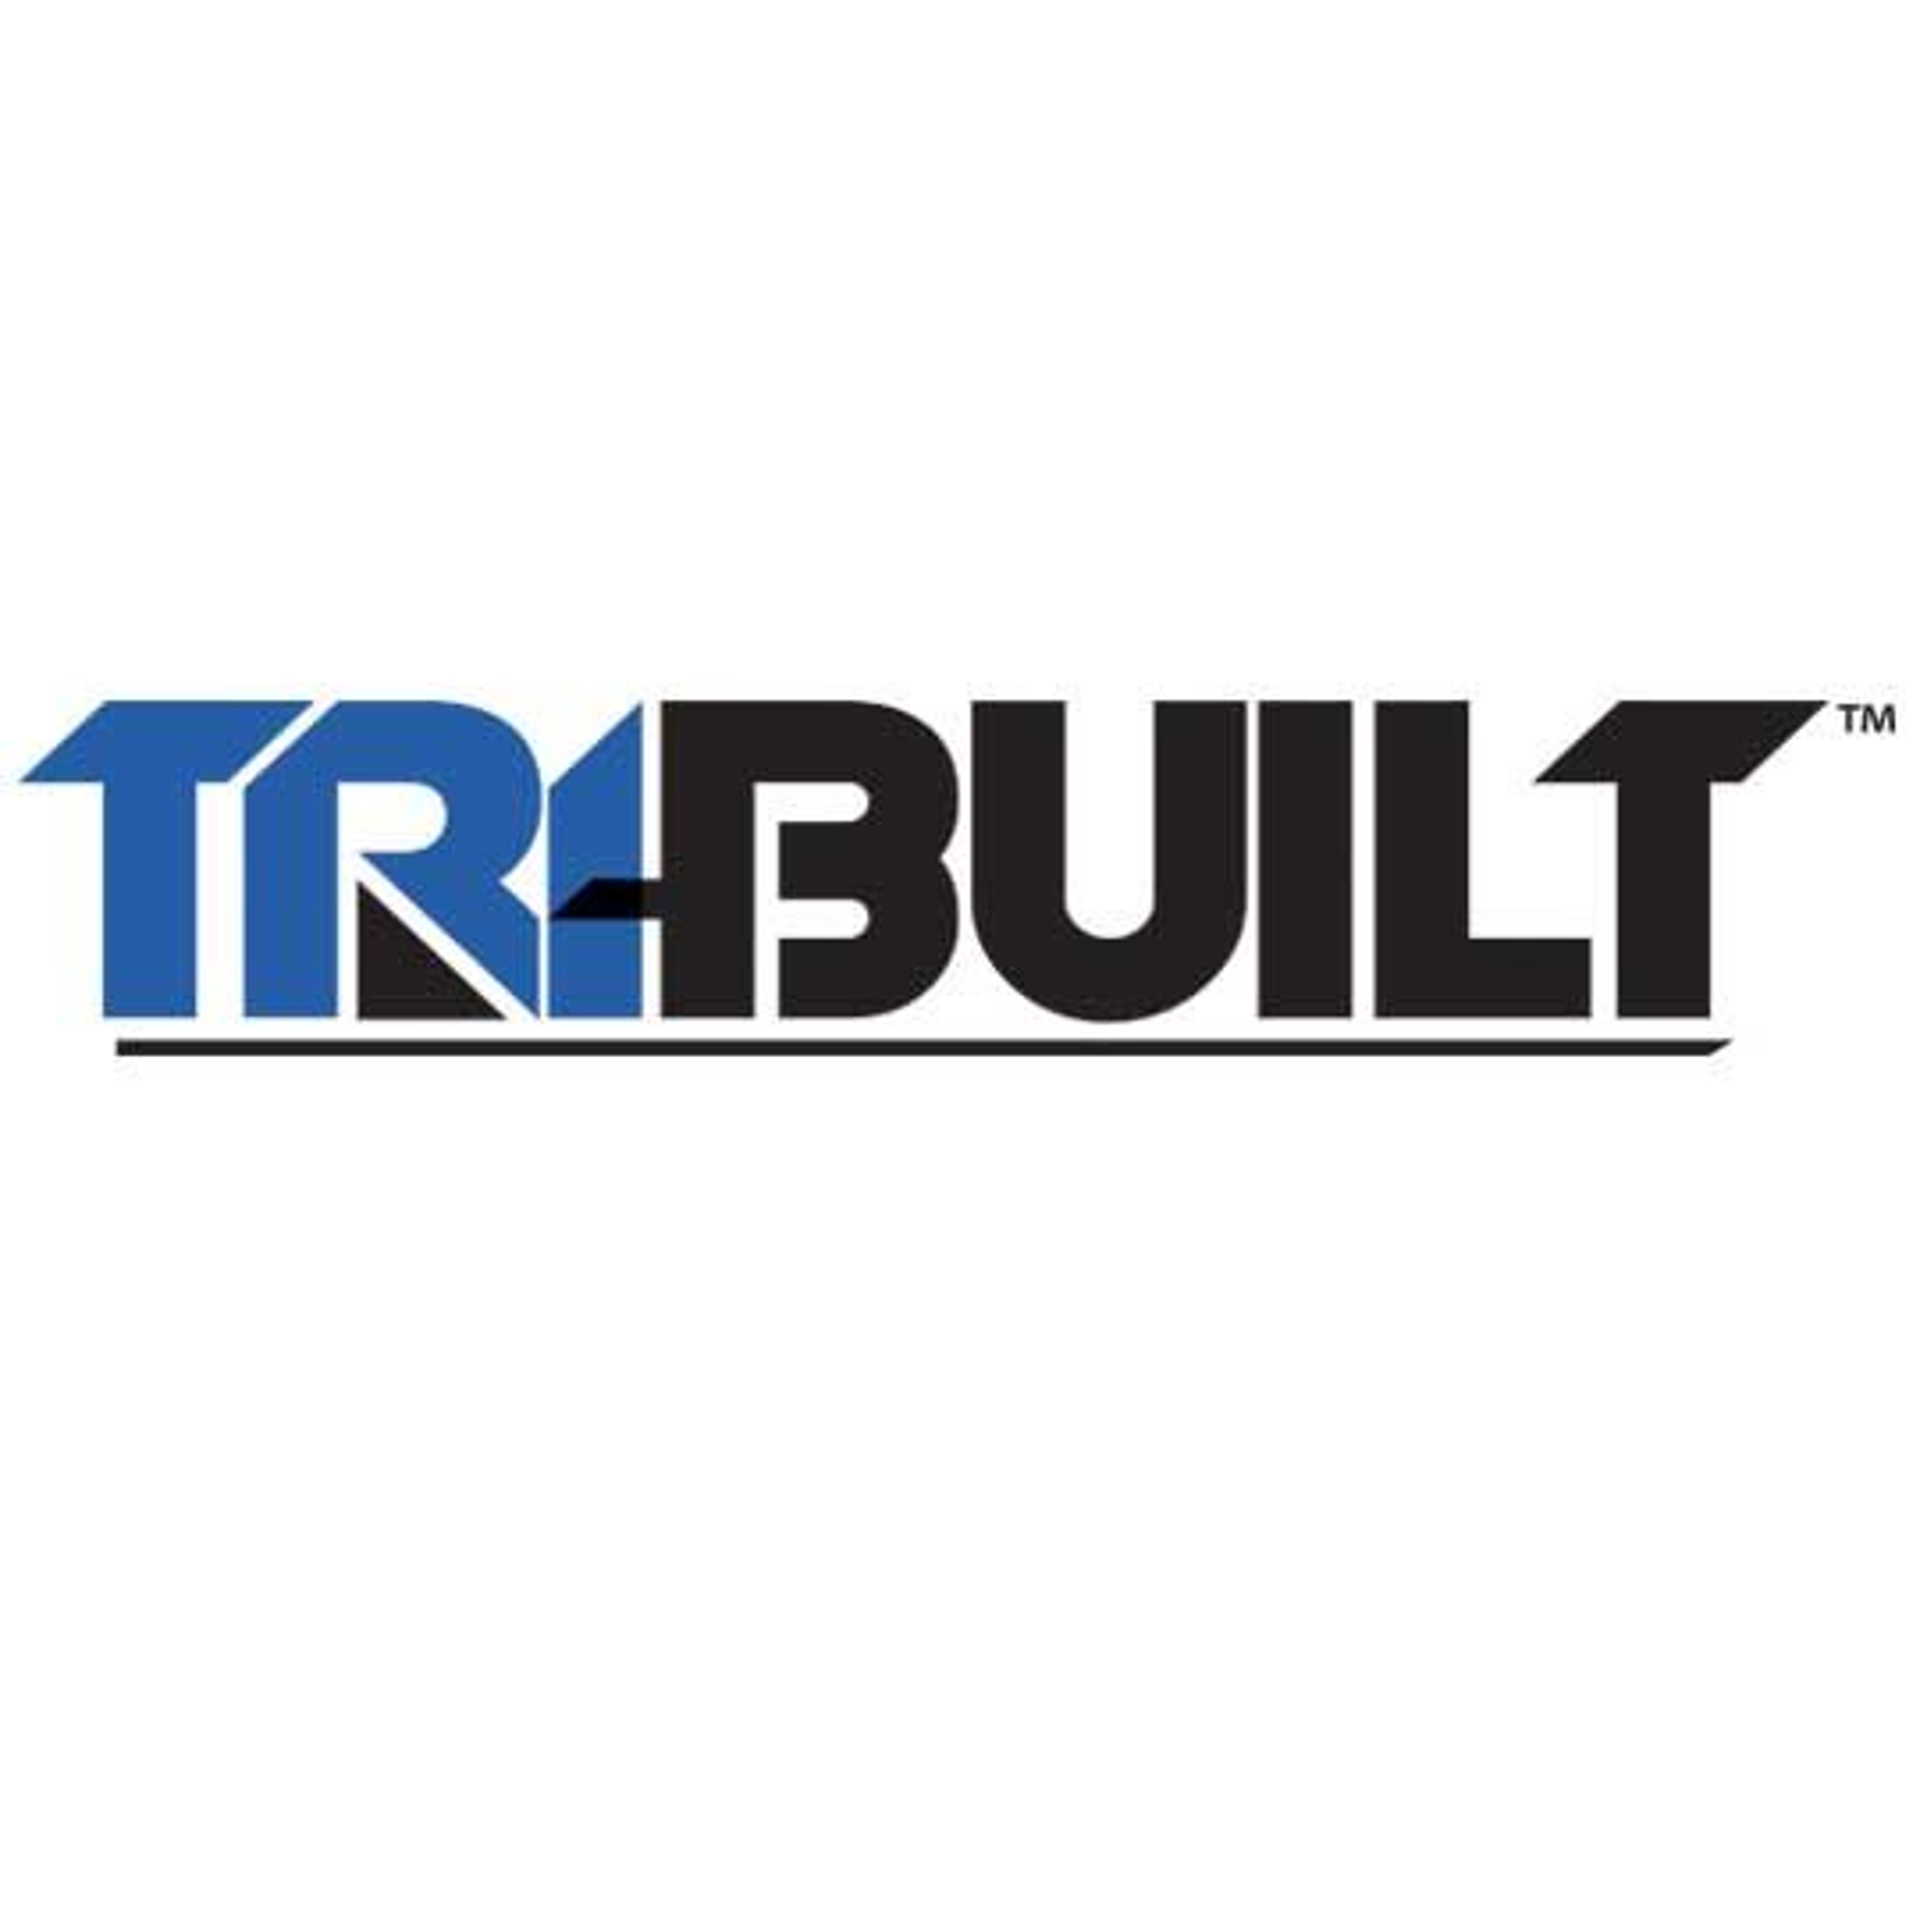 "TRI-BUILT 28 Gauge 1-1/2"" x 1-1/2"" Galvanized Roof Edge Charcoal"